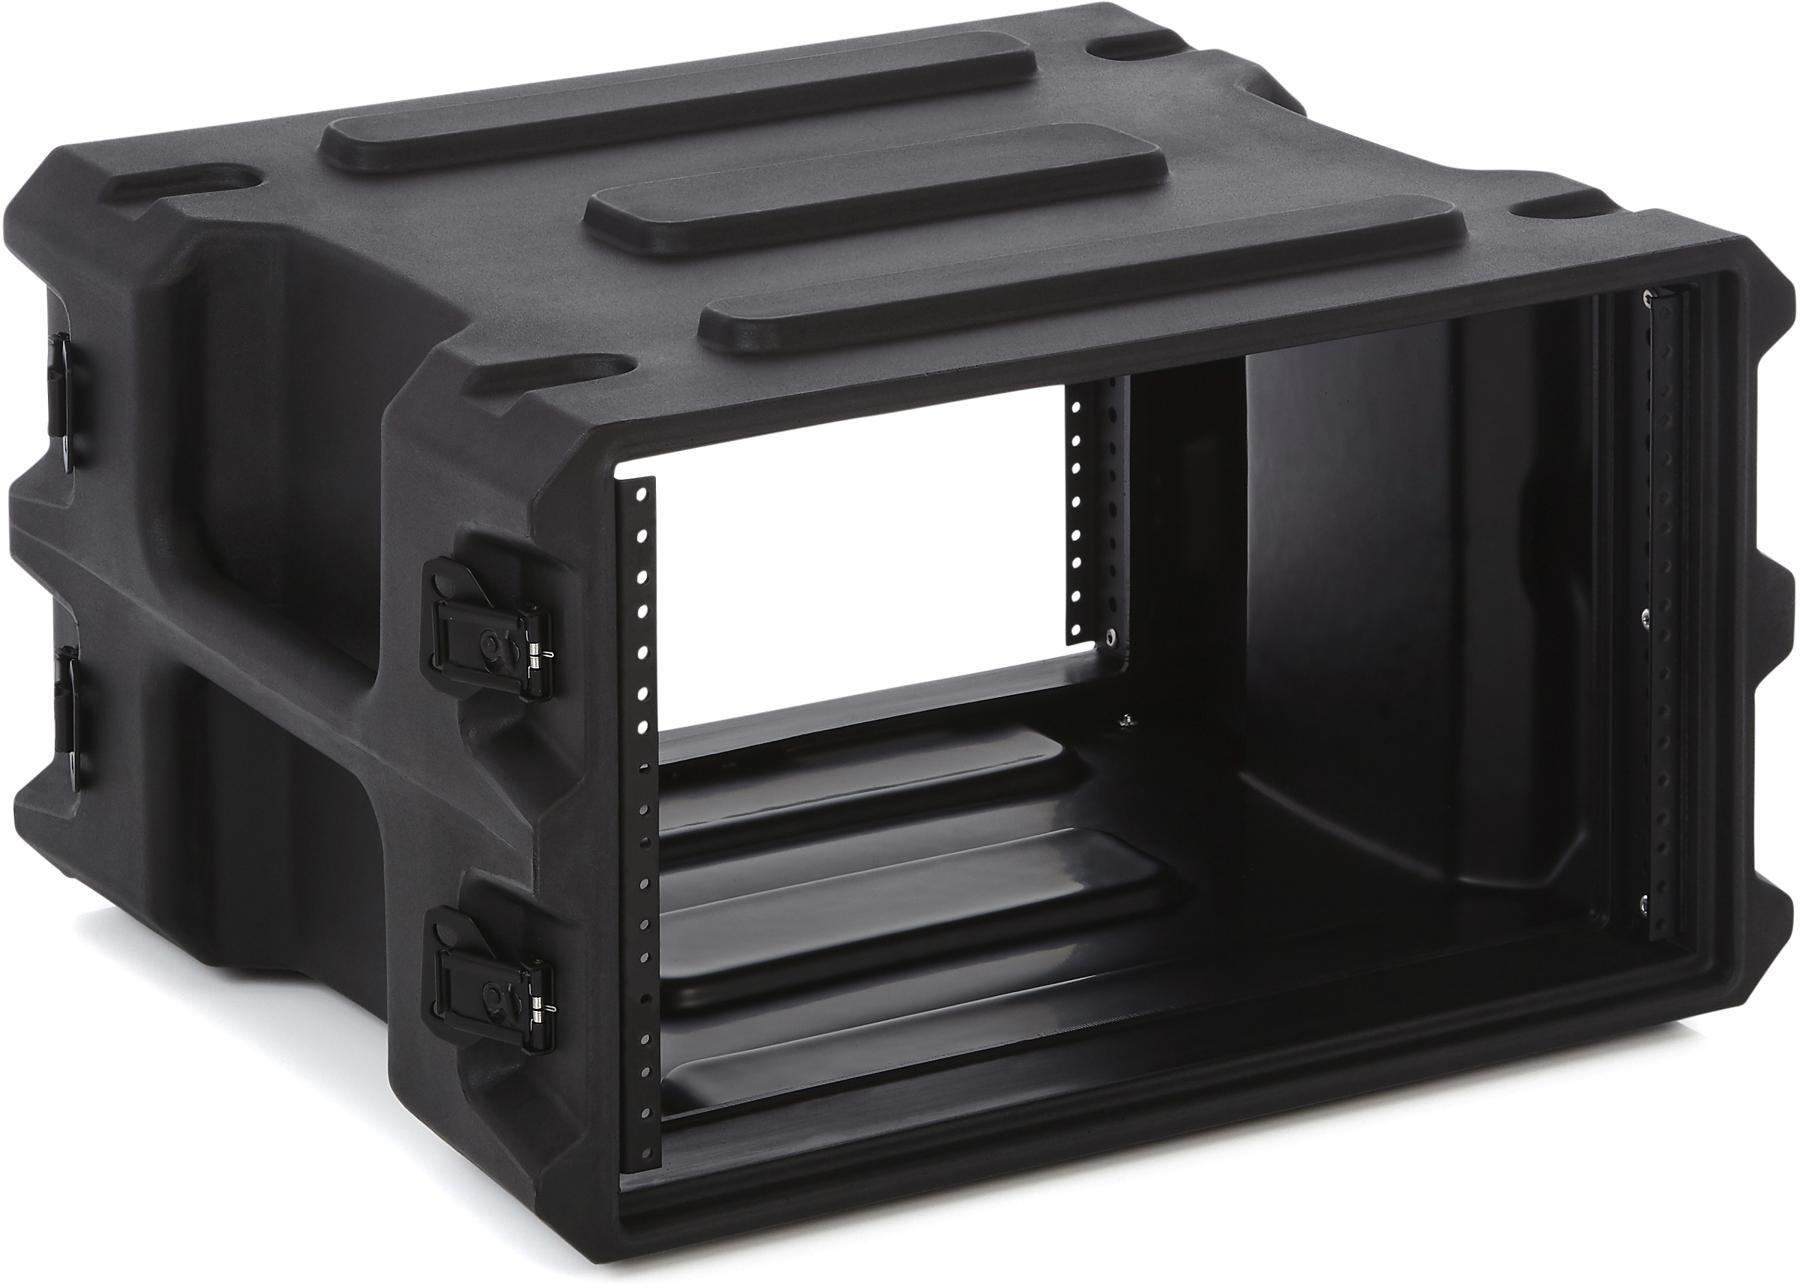 Gator G Pro 6u 19 Series Rack Case